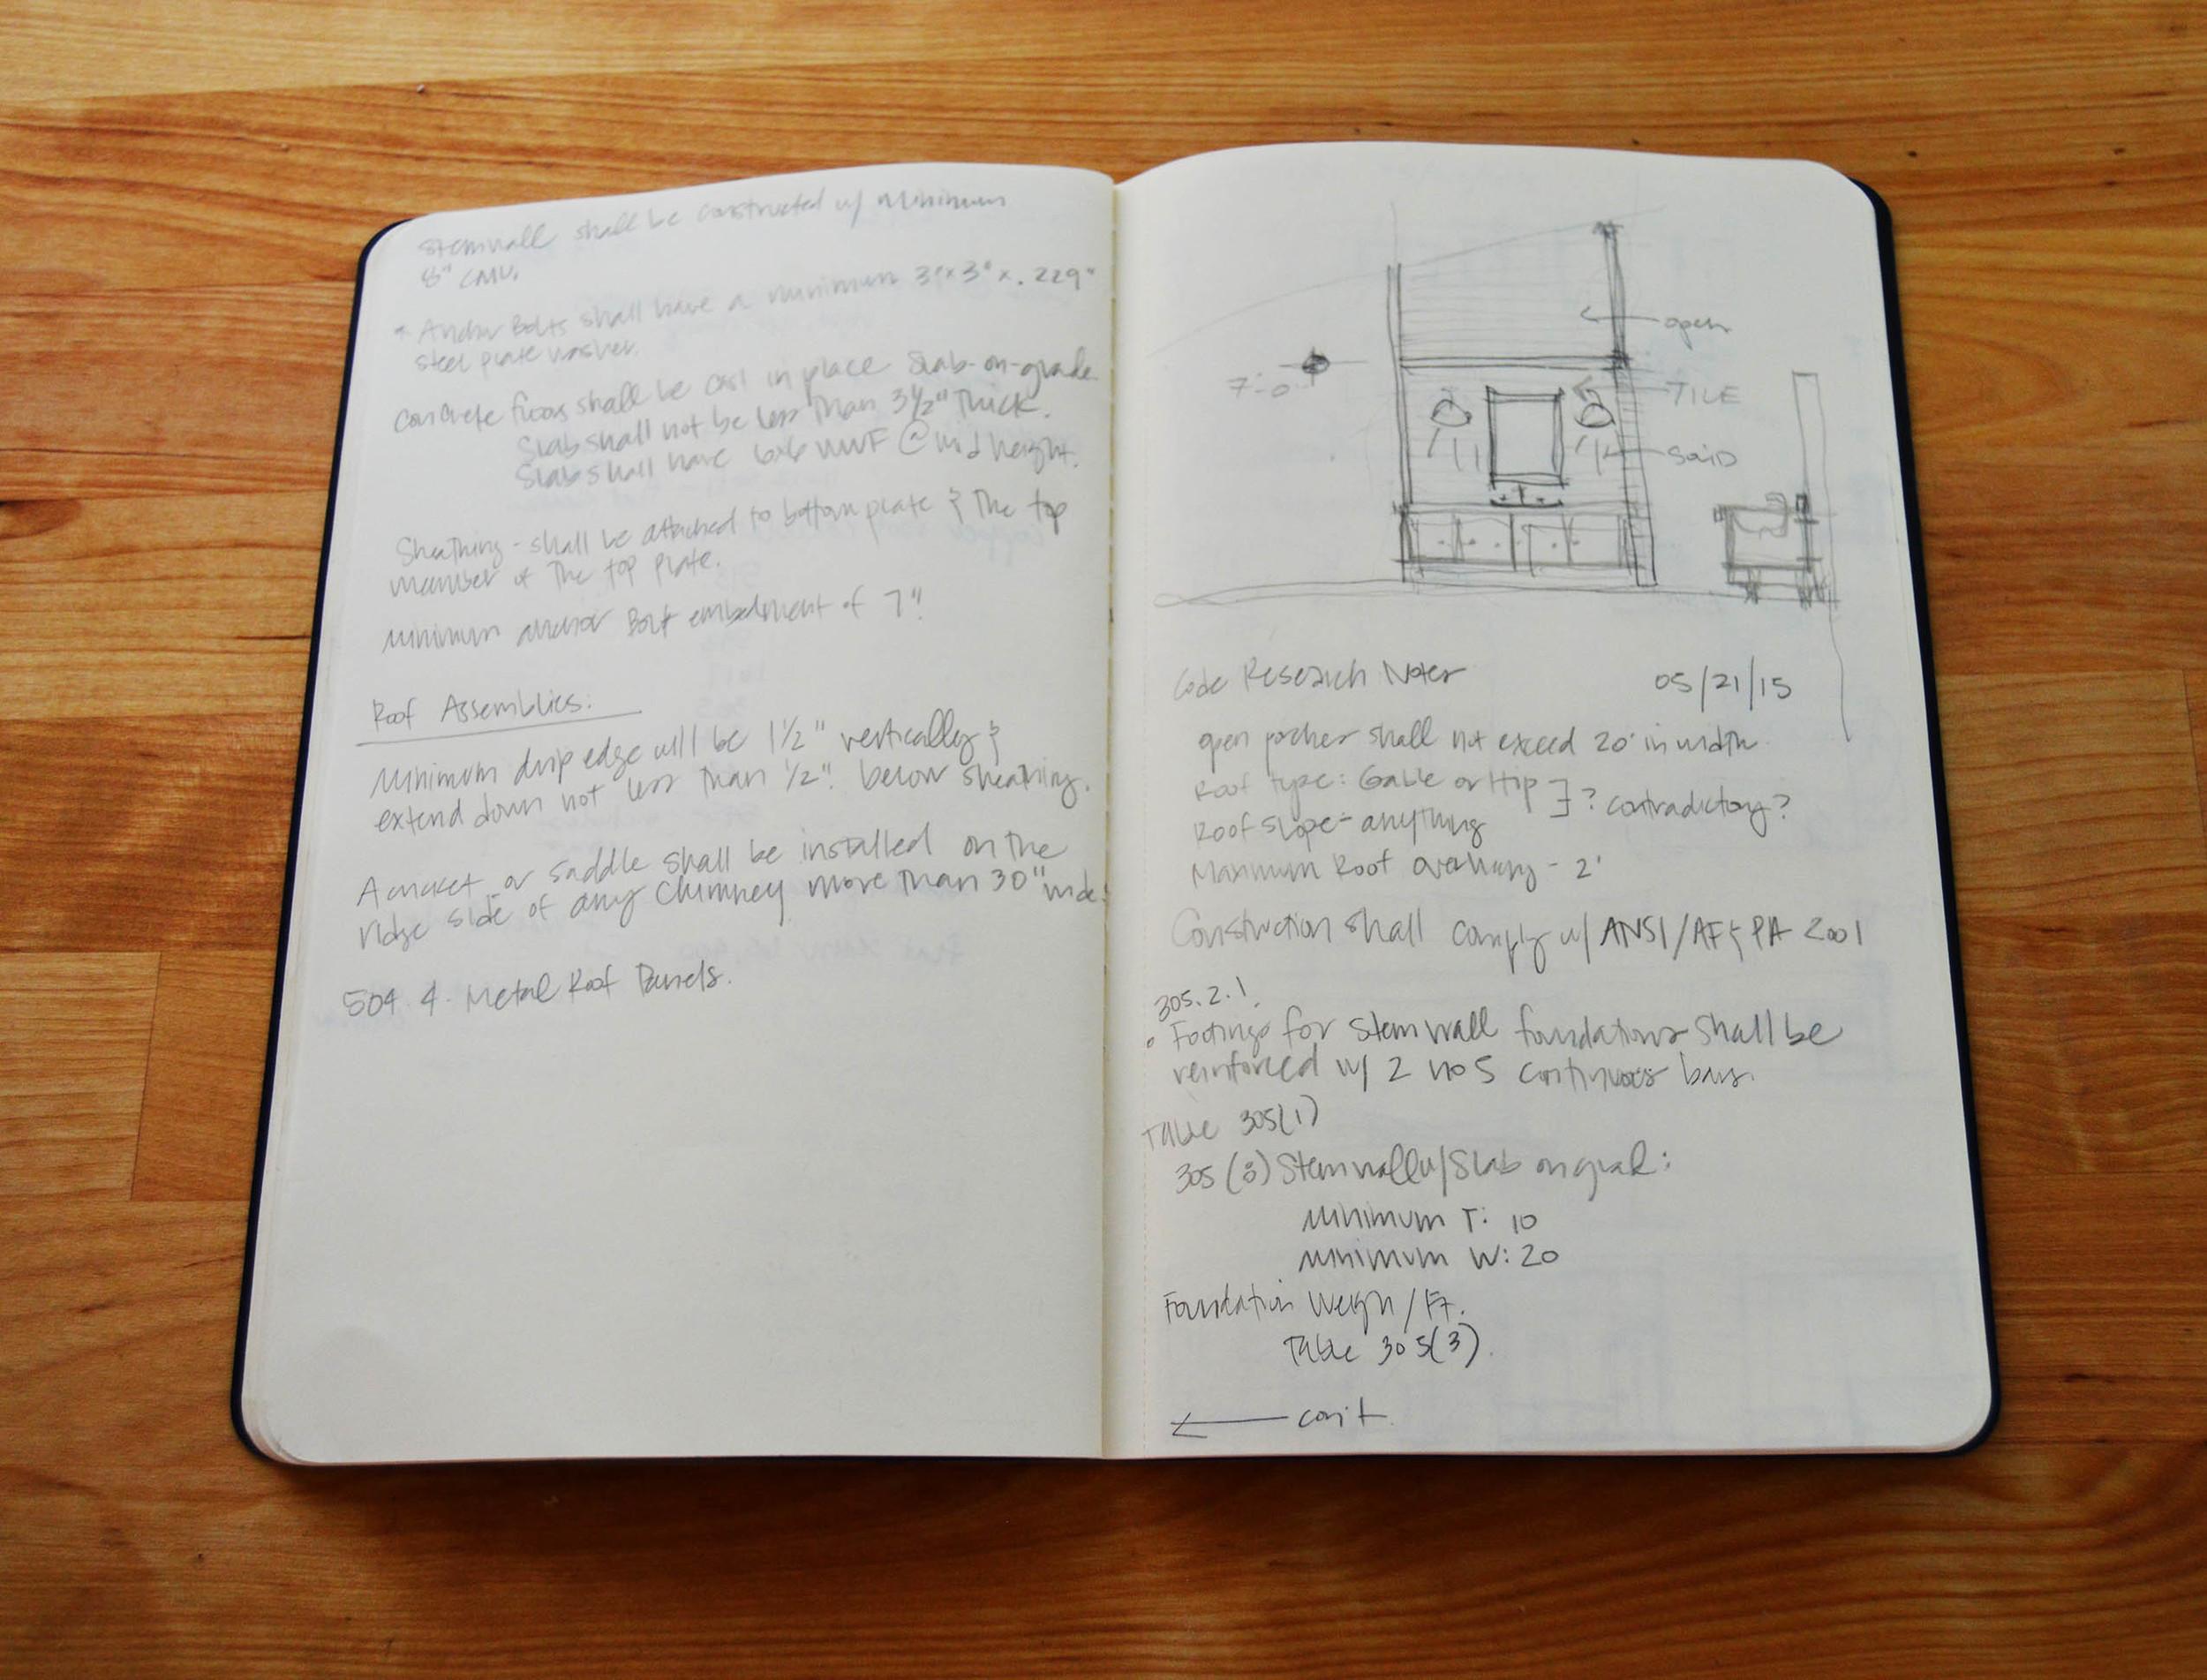 TALLstudio Bel Landes Design Development